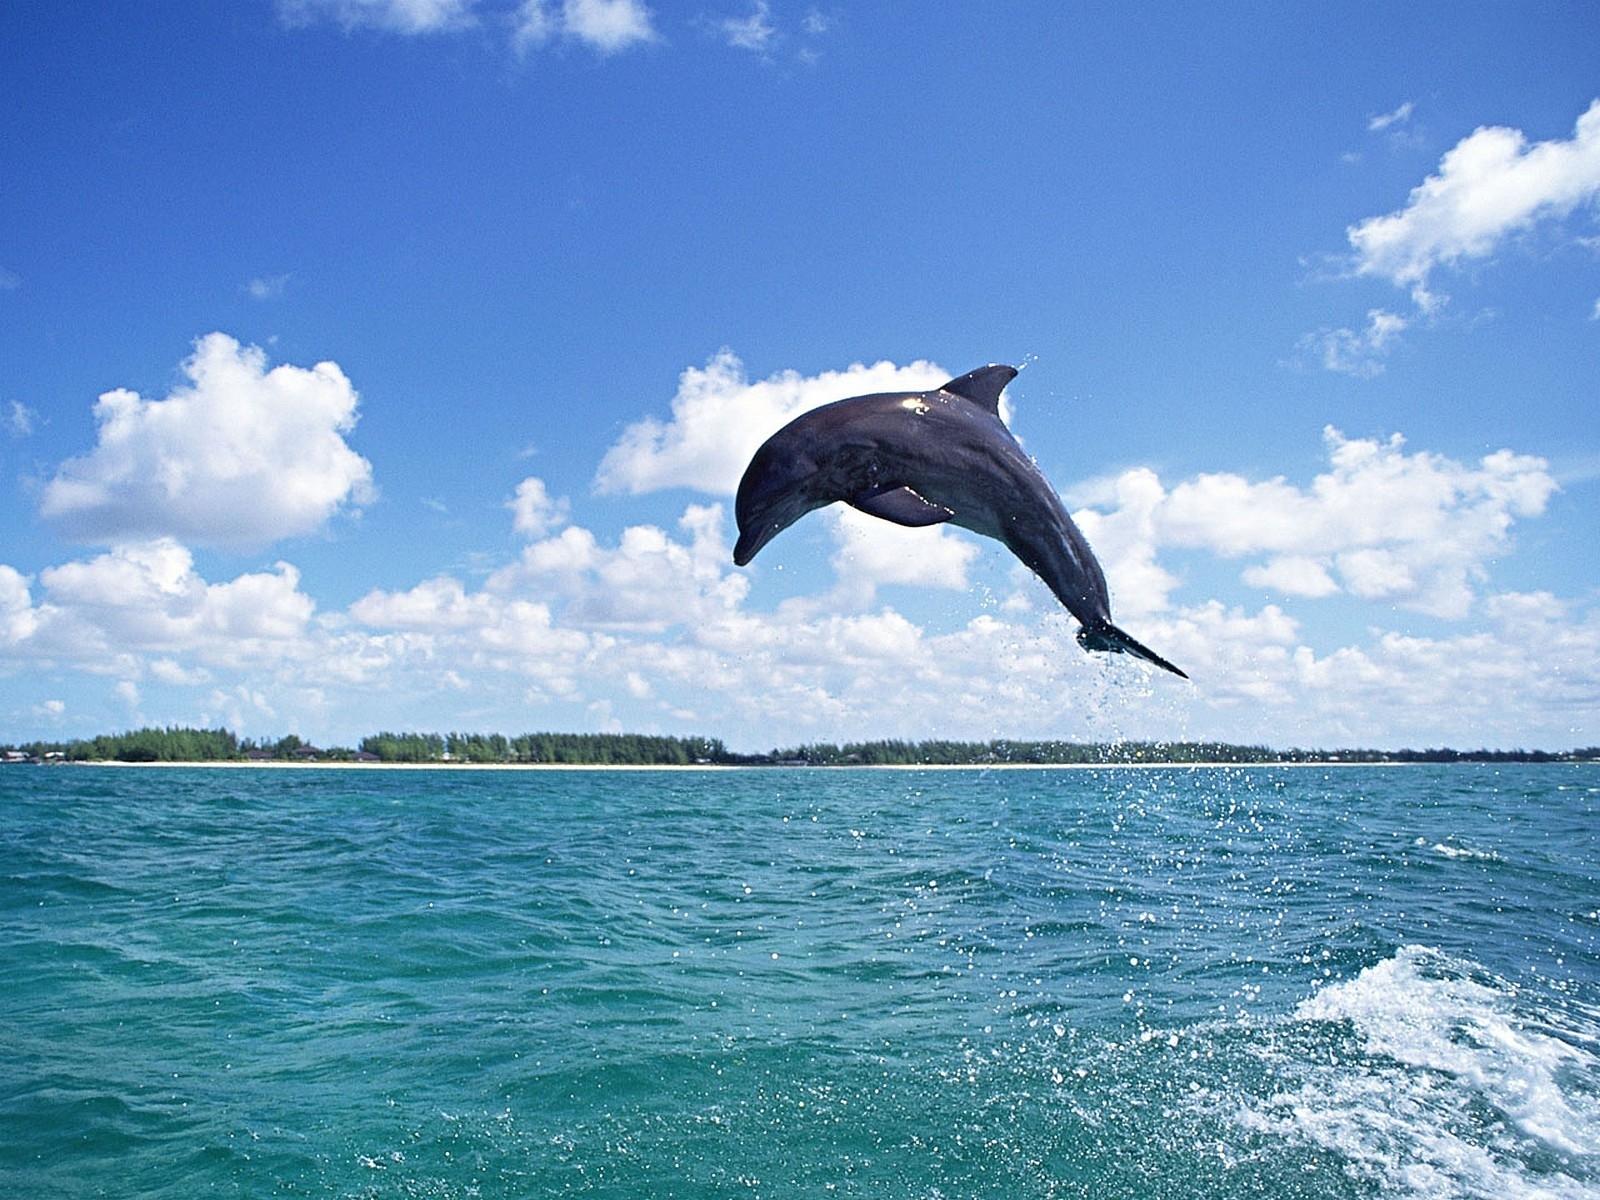 54 descargar fondo de pantalla Animales, Agua, Cielo, Delfines, Peces: protectores de pantalla e imágenes gratis